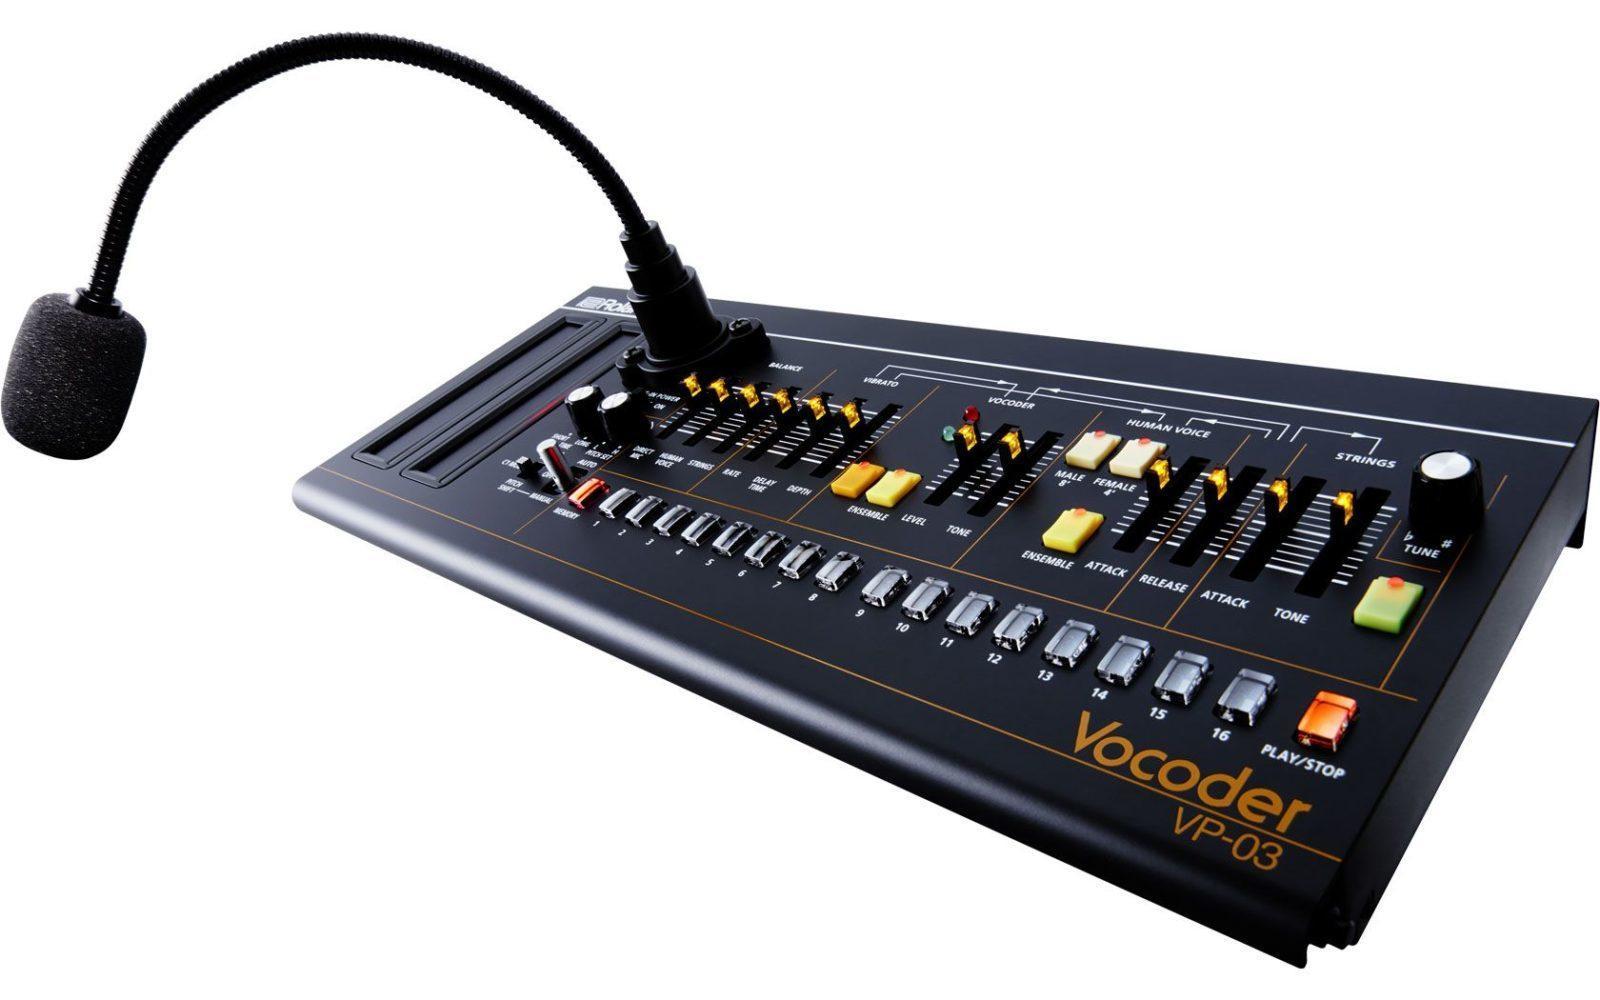 Roland VP-03 Sound Module-Digital Boutique